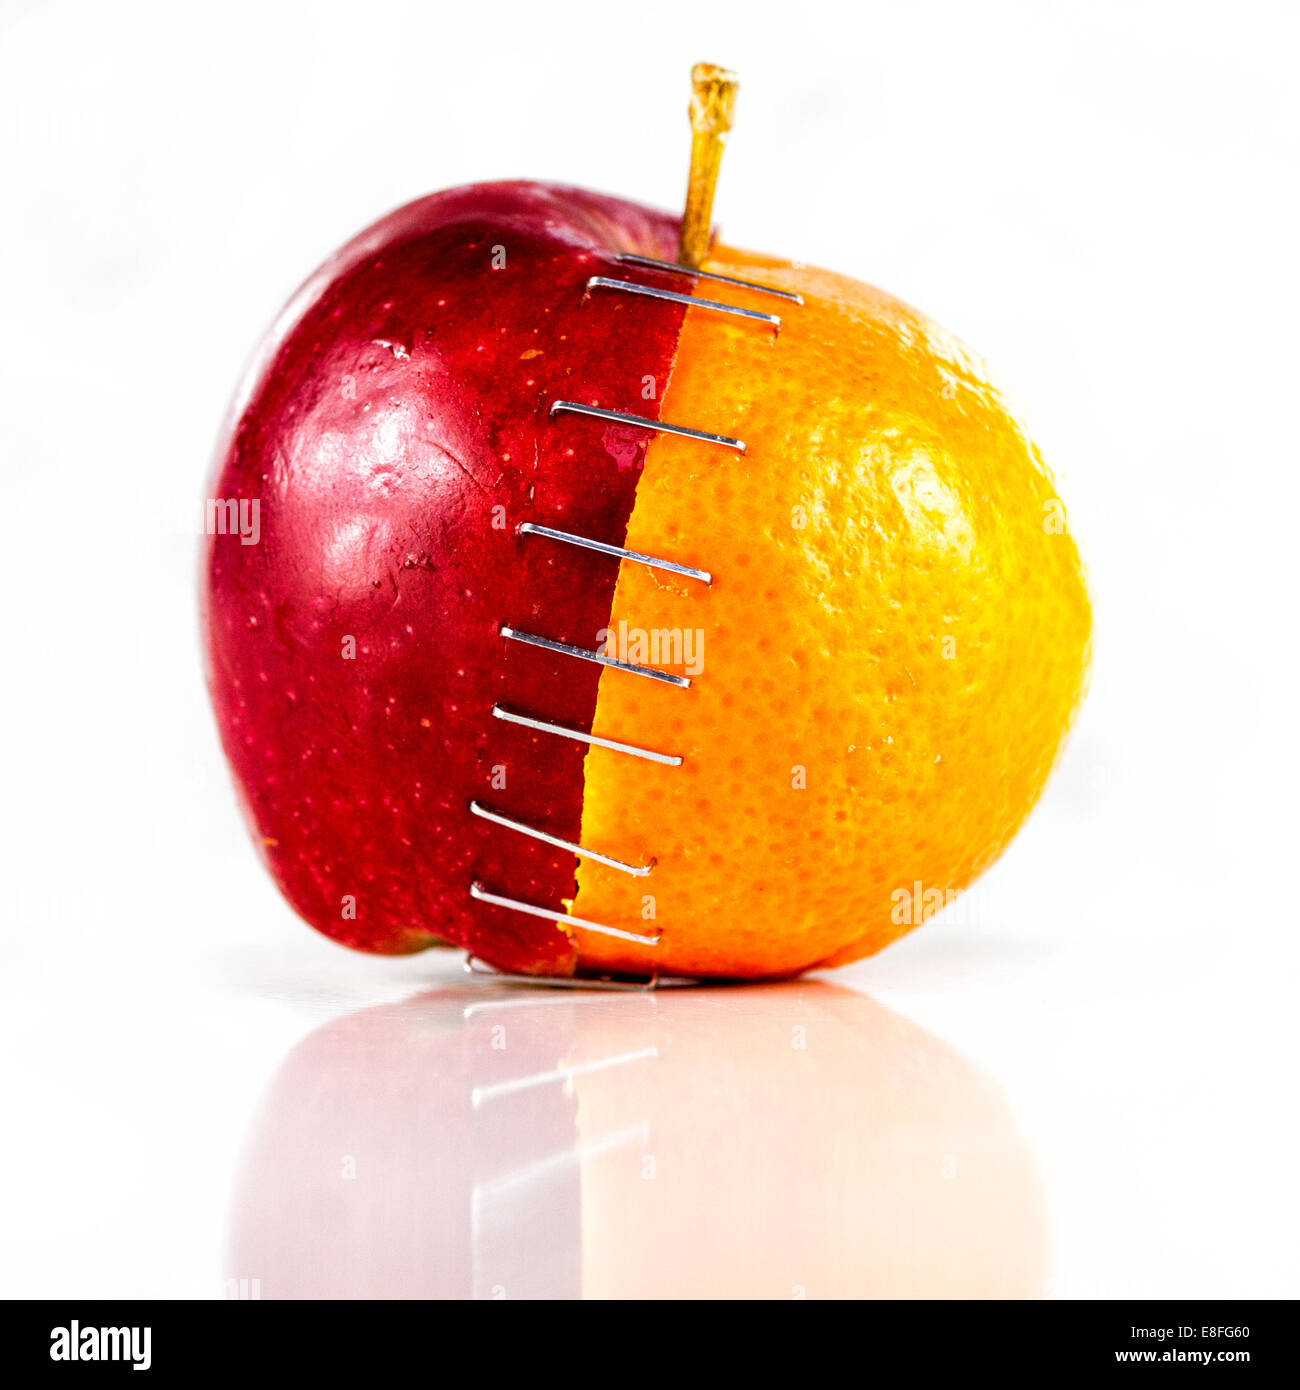 Manzana y naranja grapa Imagen De Stock